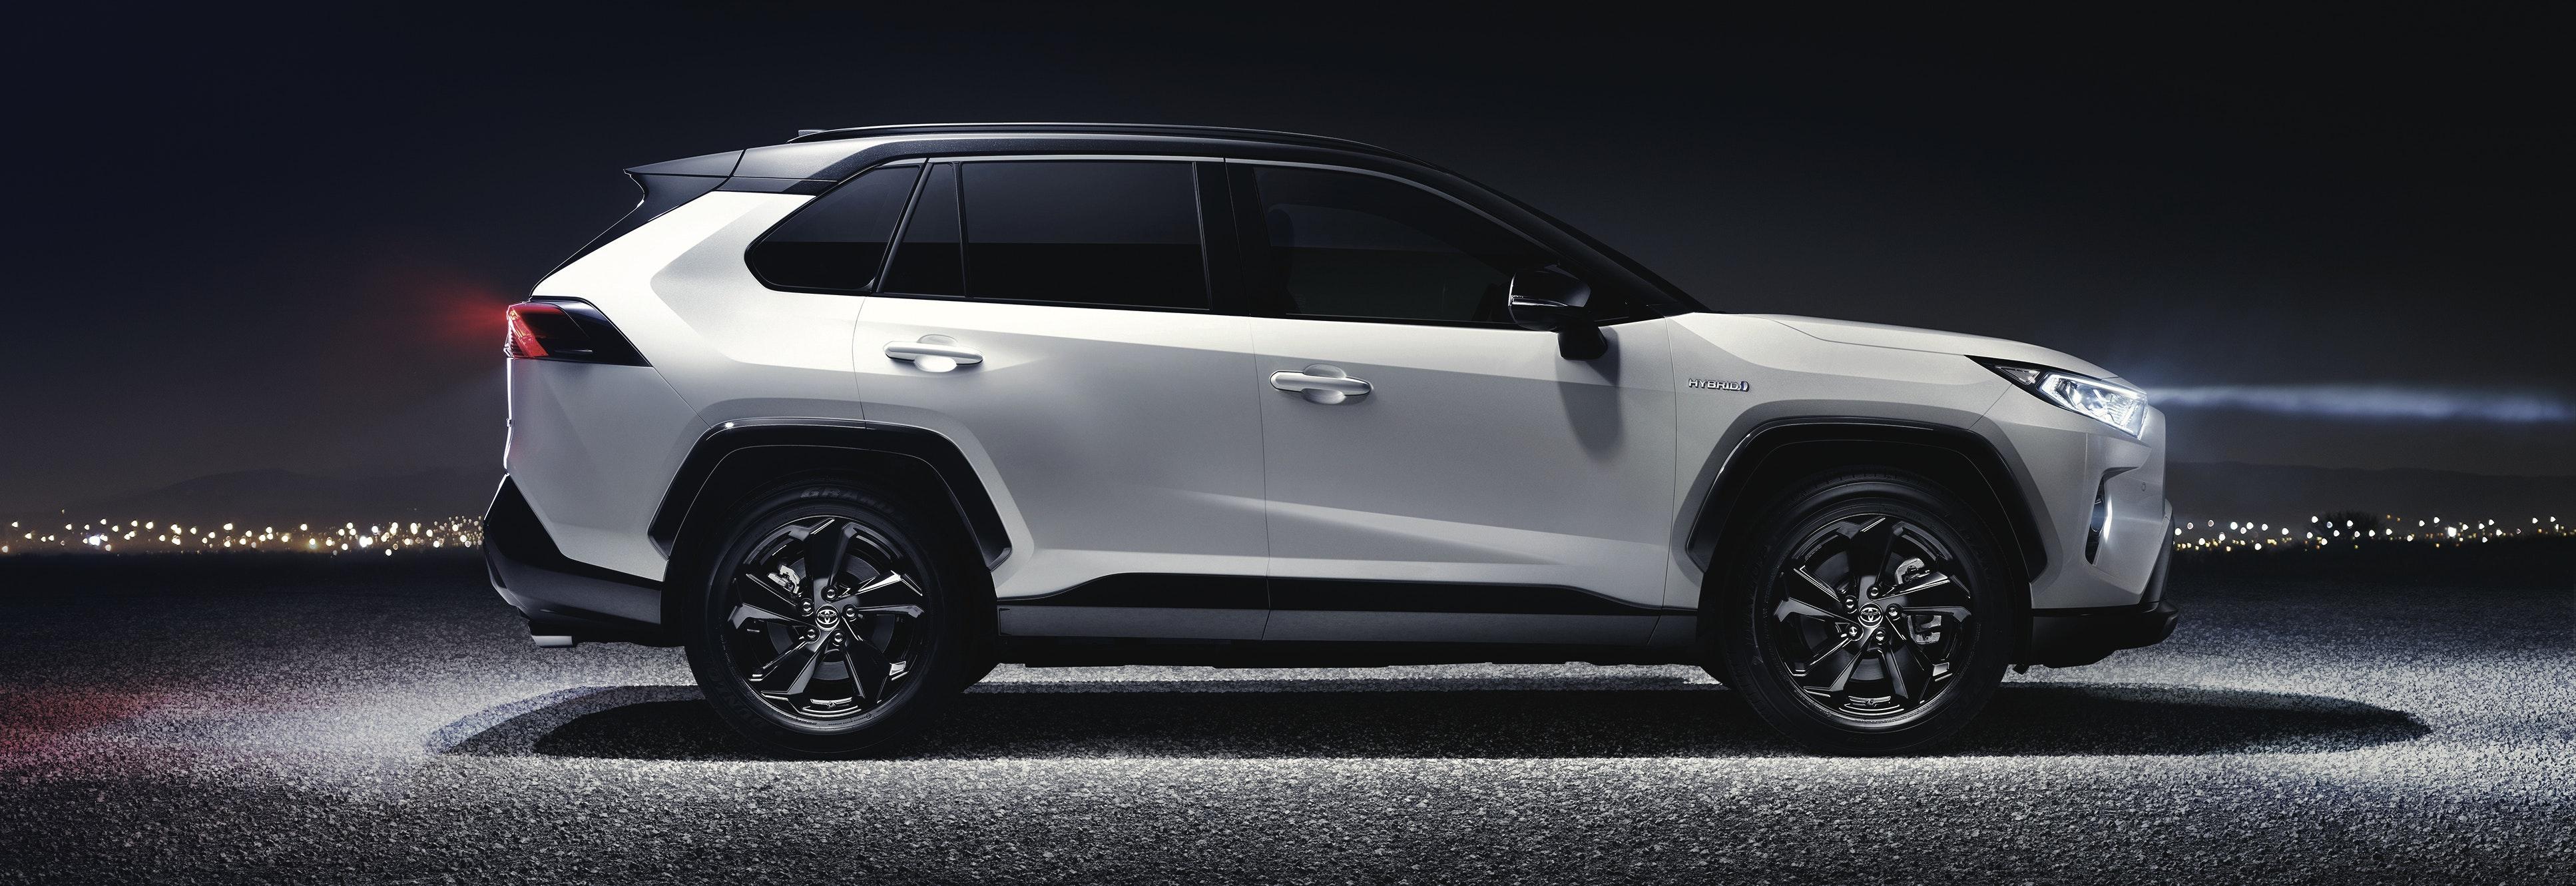 Honda Suv Canada U003eu003e 2019 Toyota RAV4 Price, Specs, And Release Date |